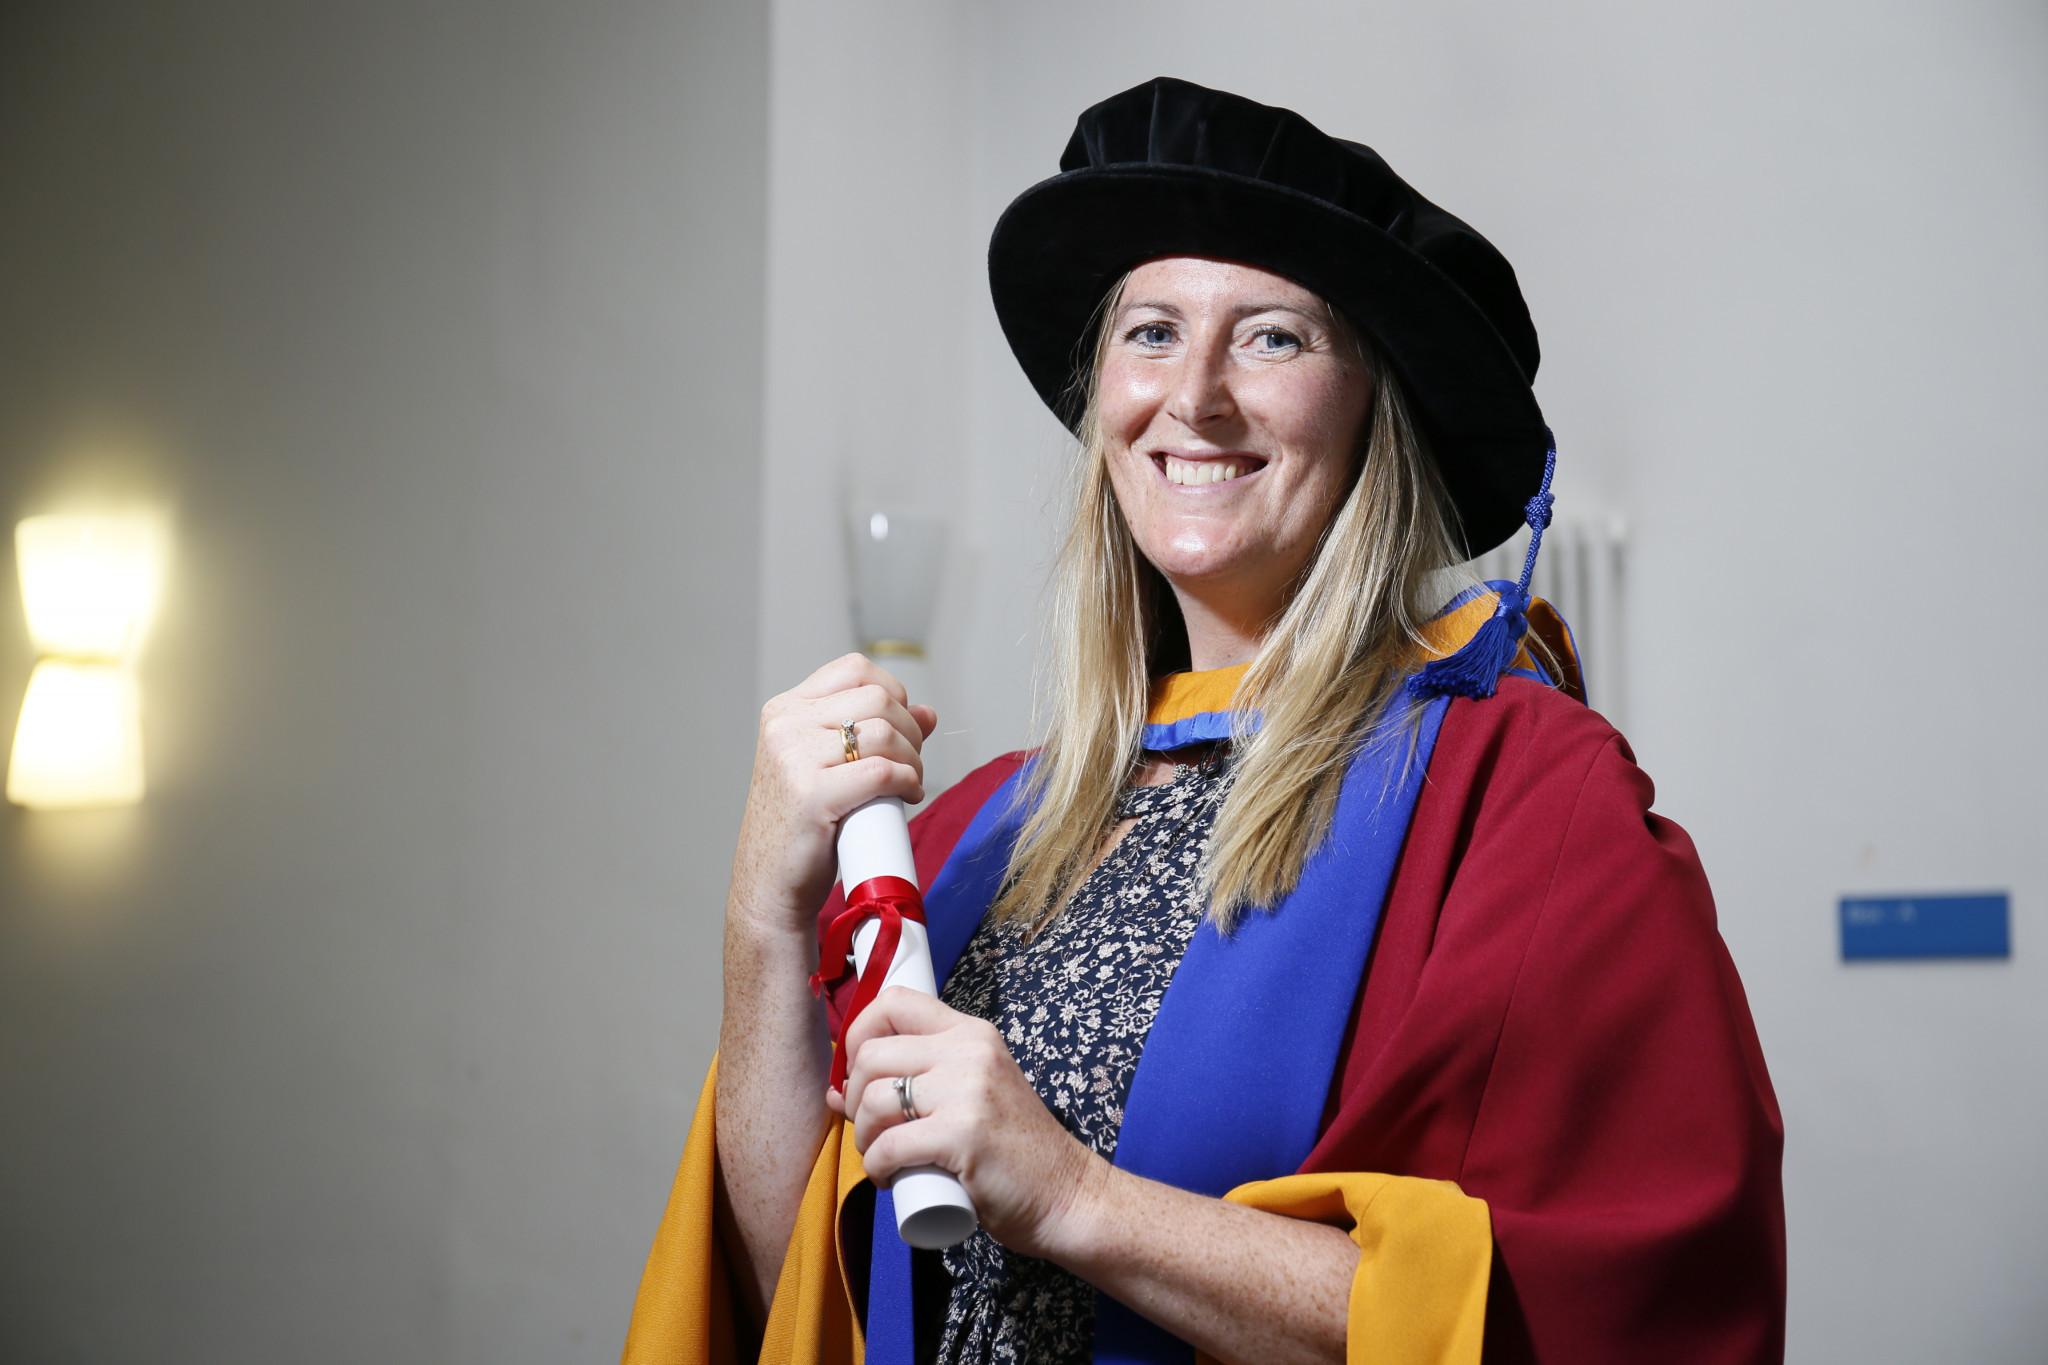 Para-rowing world champion Aggar given honorary degree by Leeds Beckett